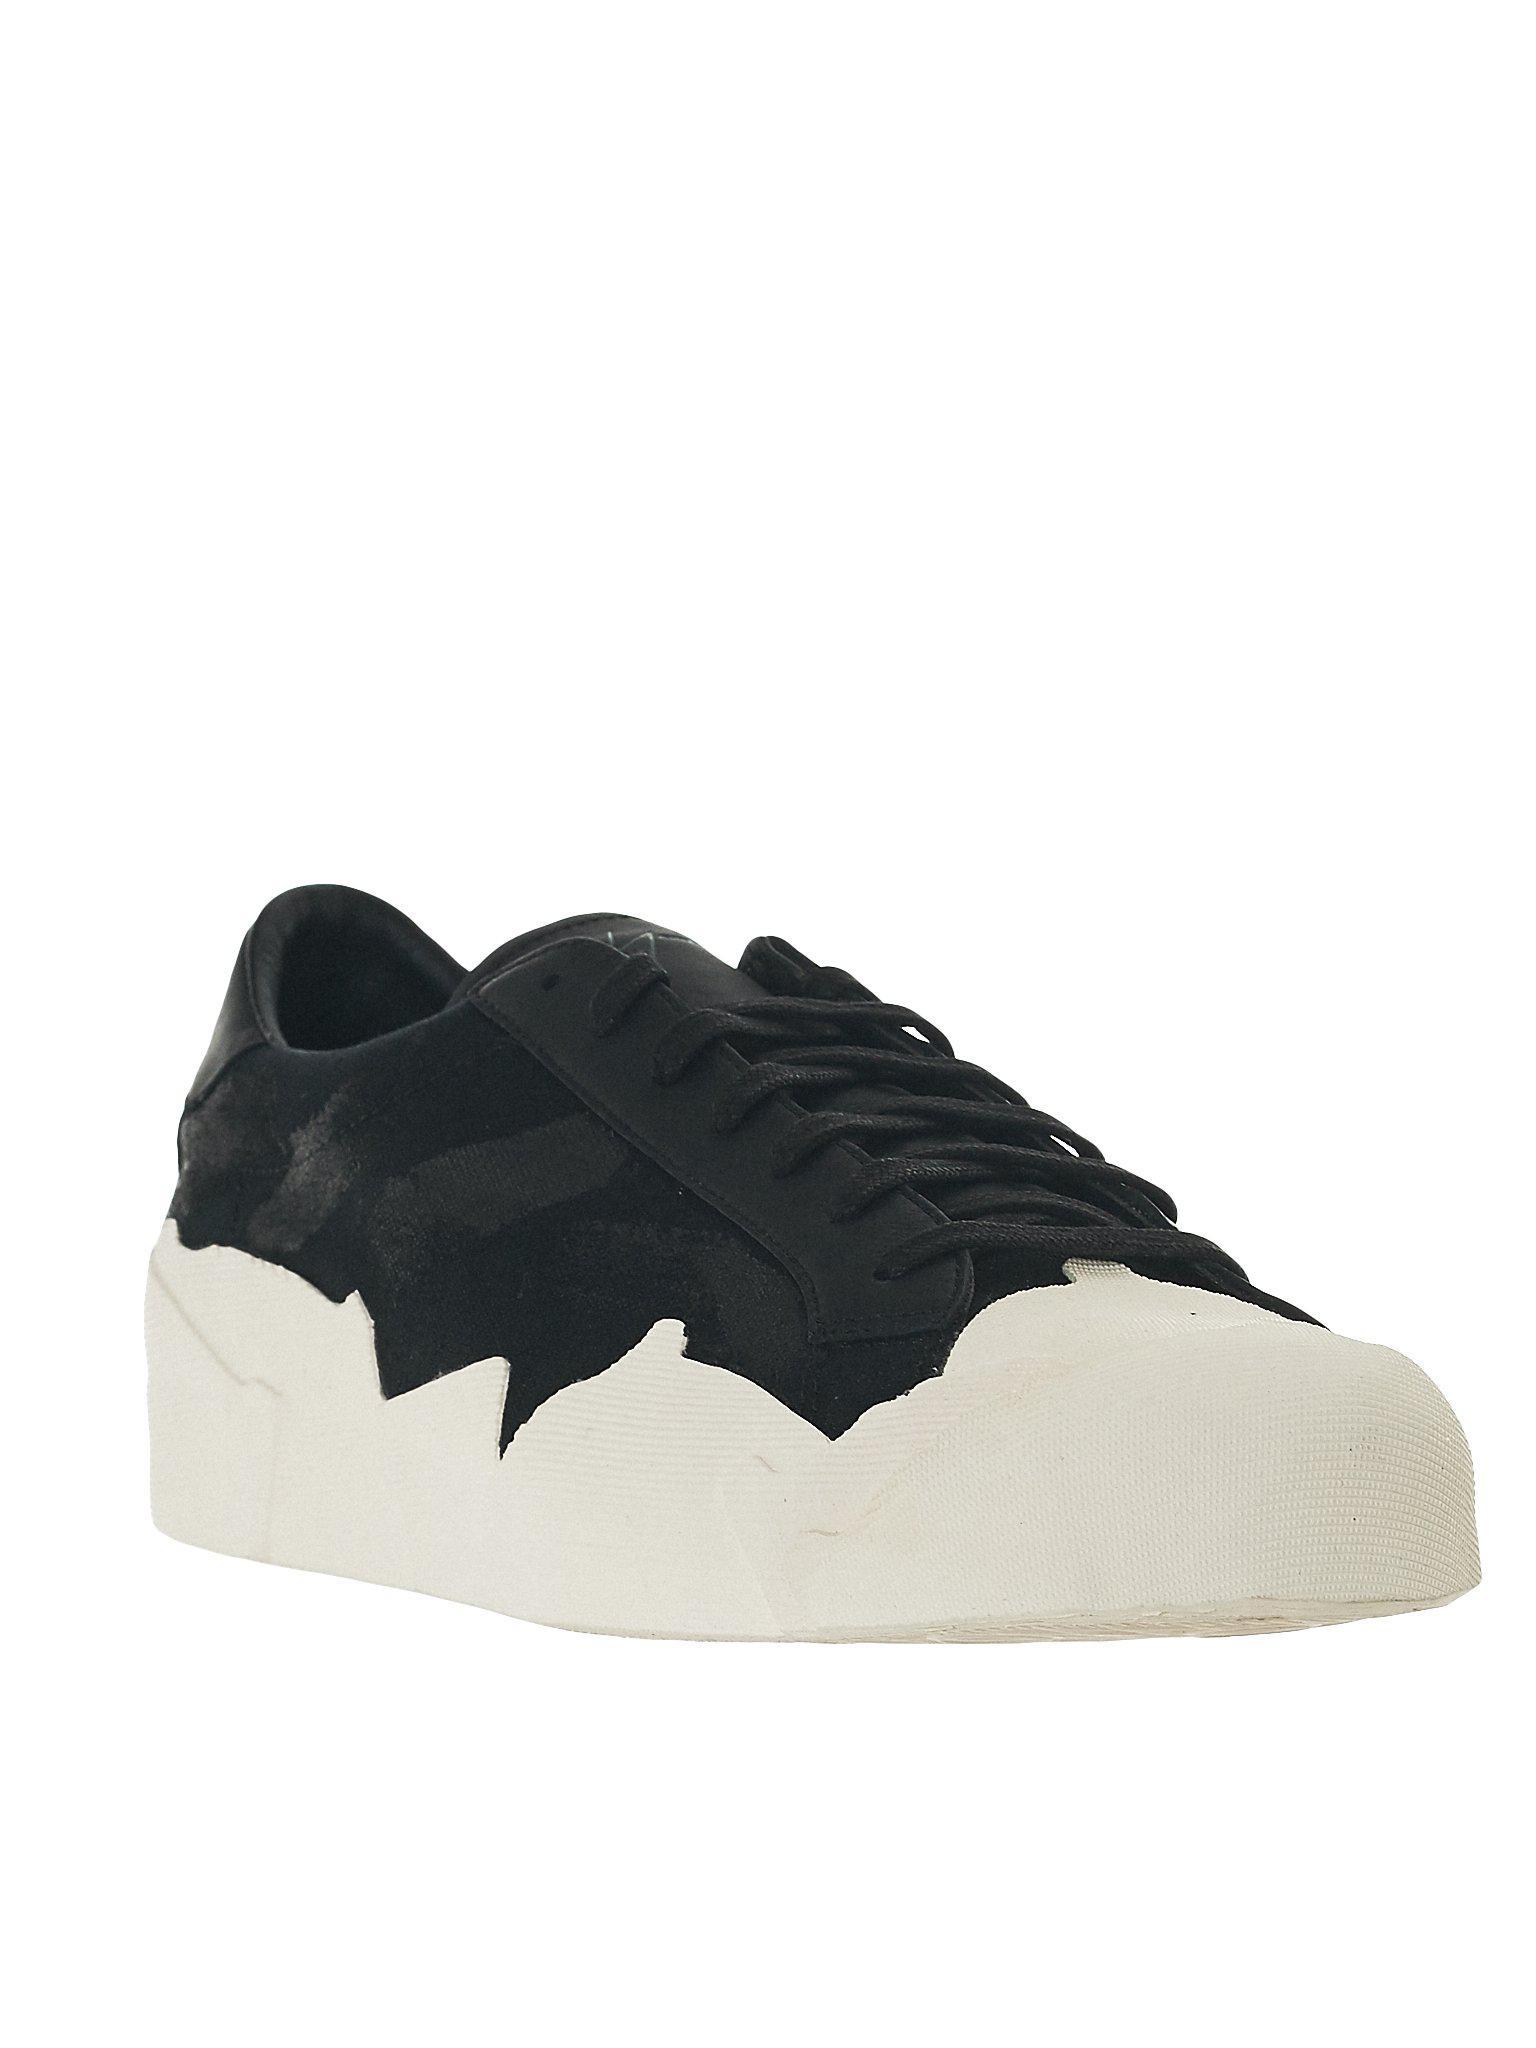 25088a9856065 Lyst - Yohji Yamamoto  takusan  Lace-up Sneakers in Black for Men